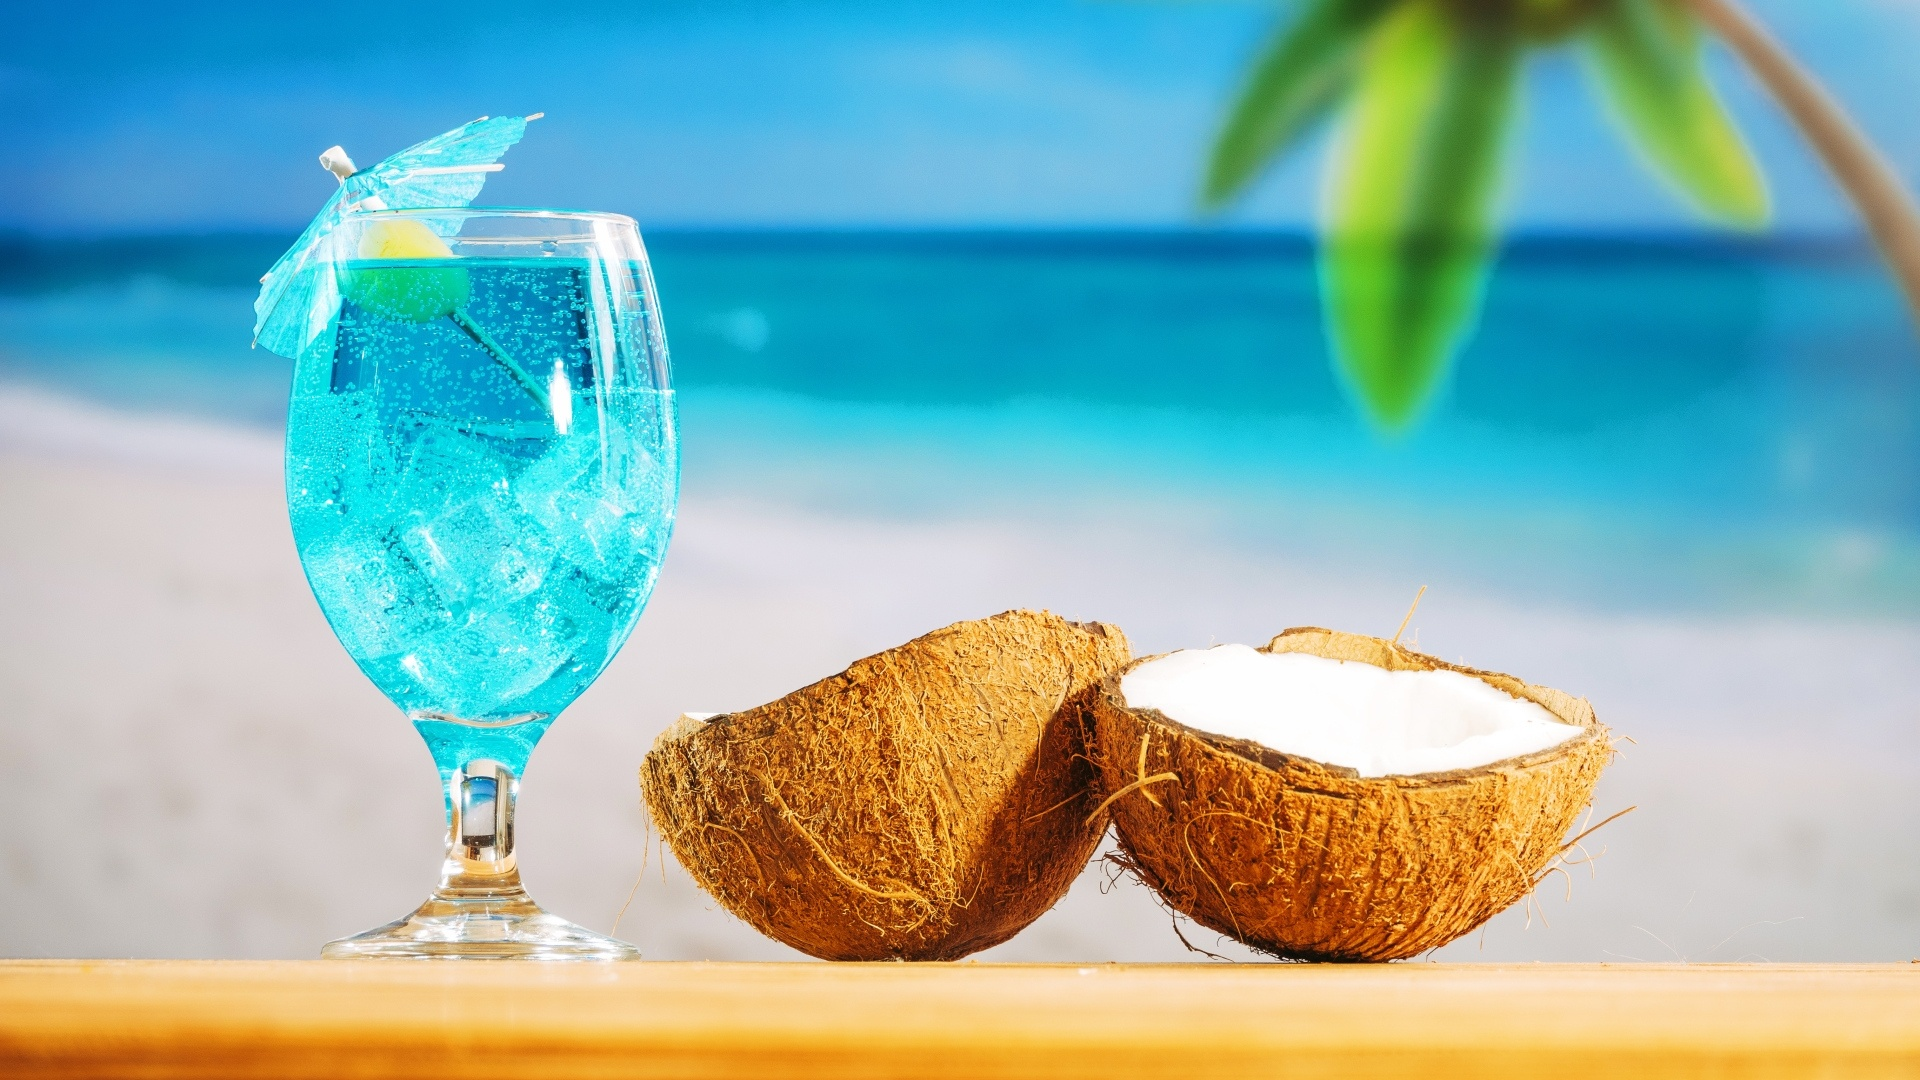 Coconuts By The Sea desktop wallpaper free download